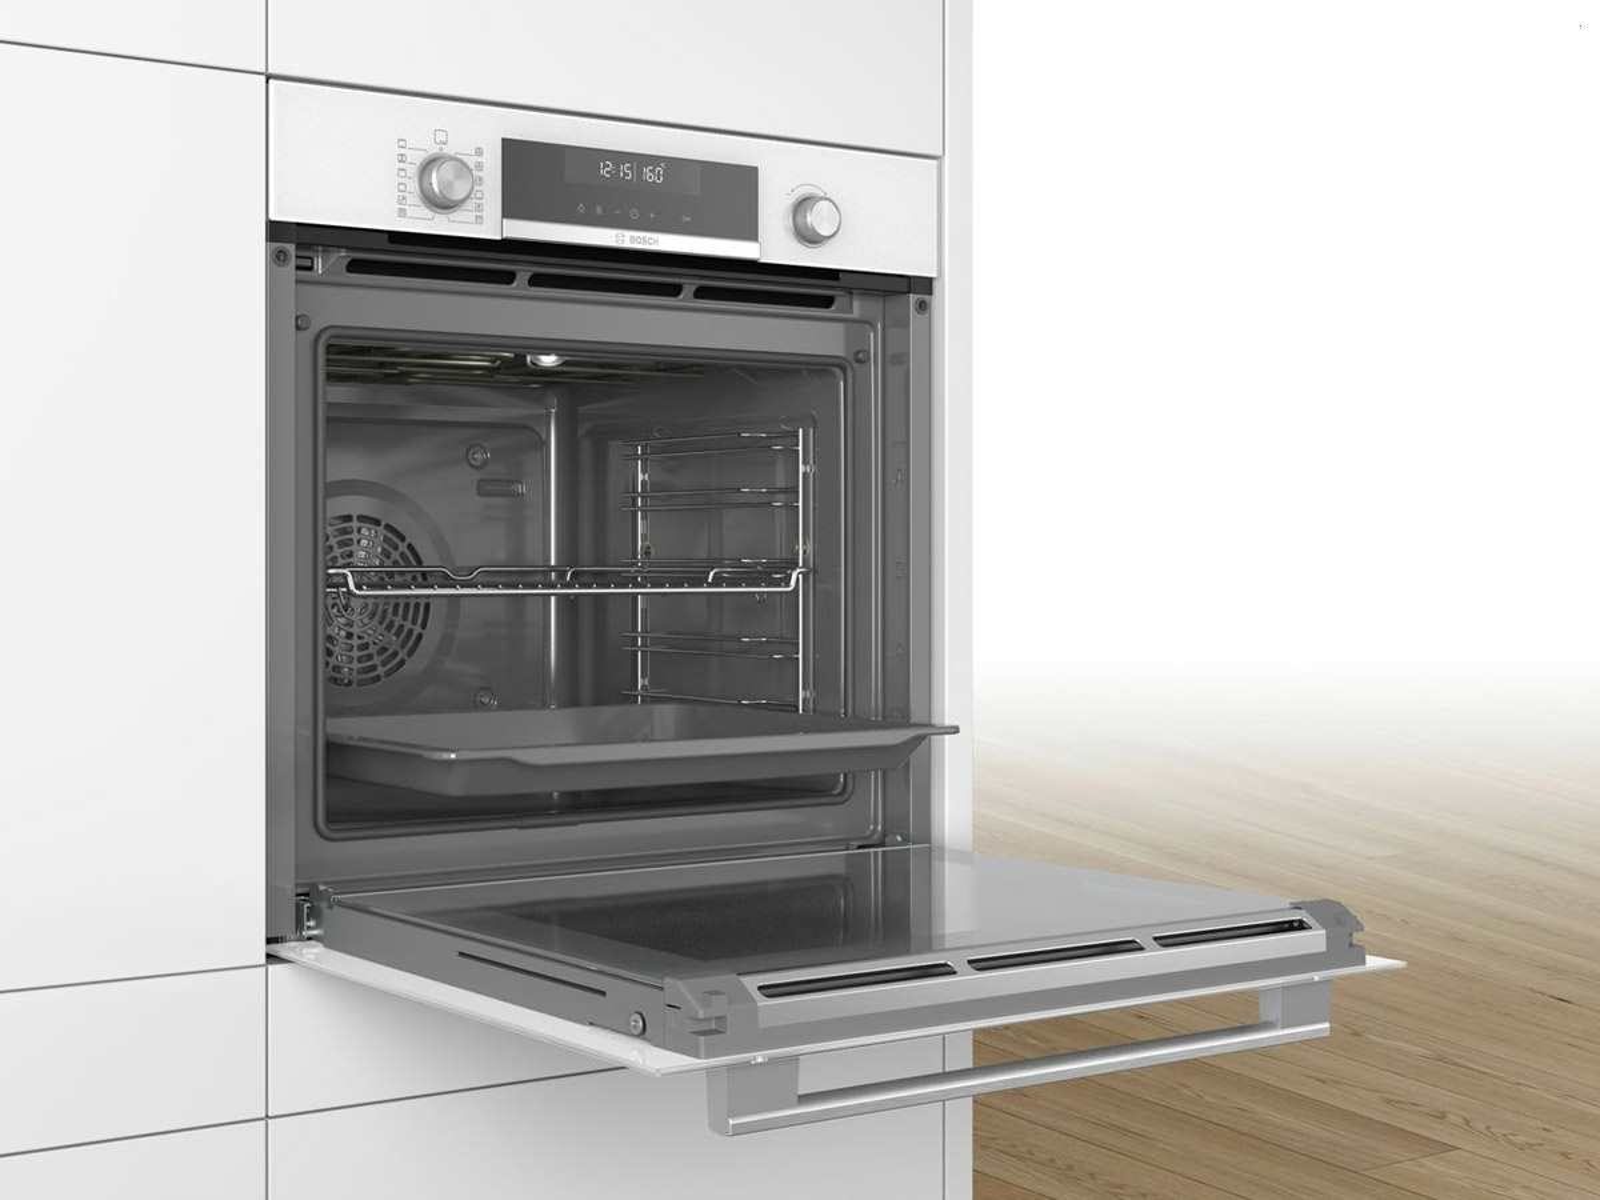 bosch hba578bw0 pyrolyse backofen polar wei. Black Bedroom Furniture Sets. Home Design Ideas